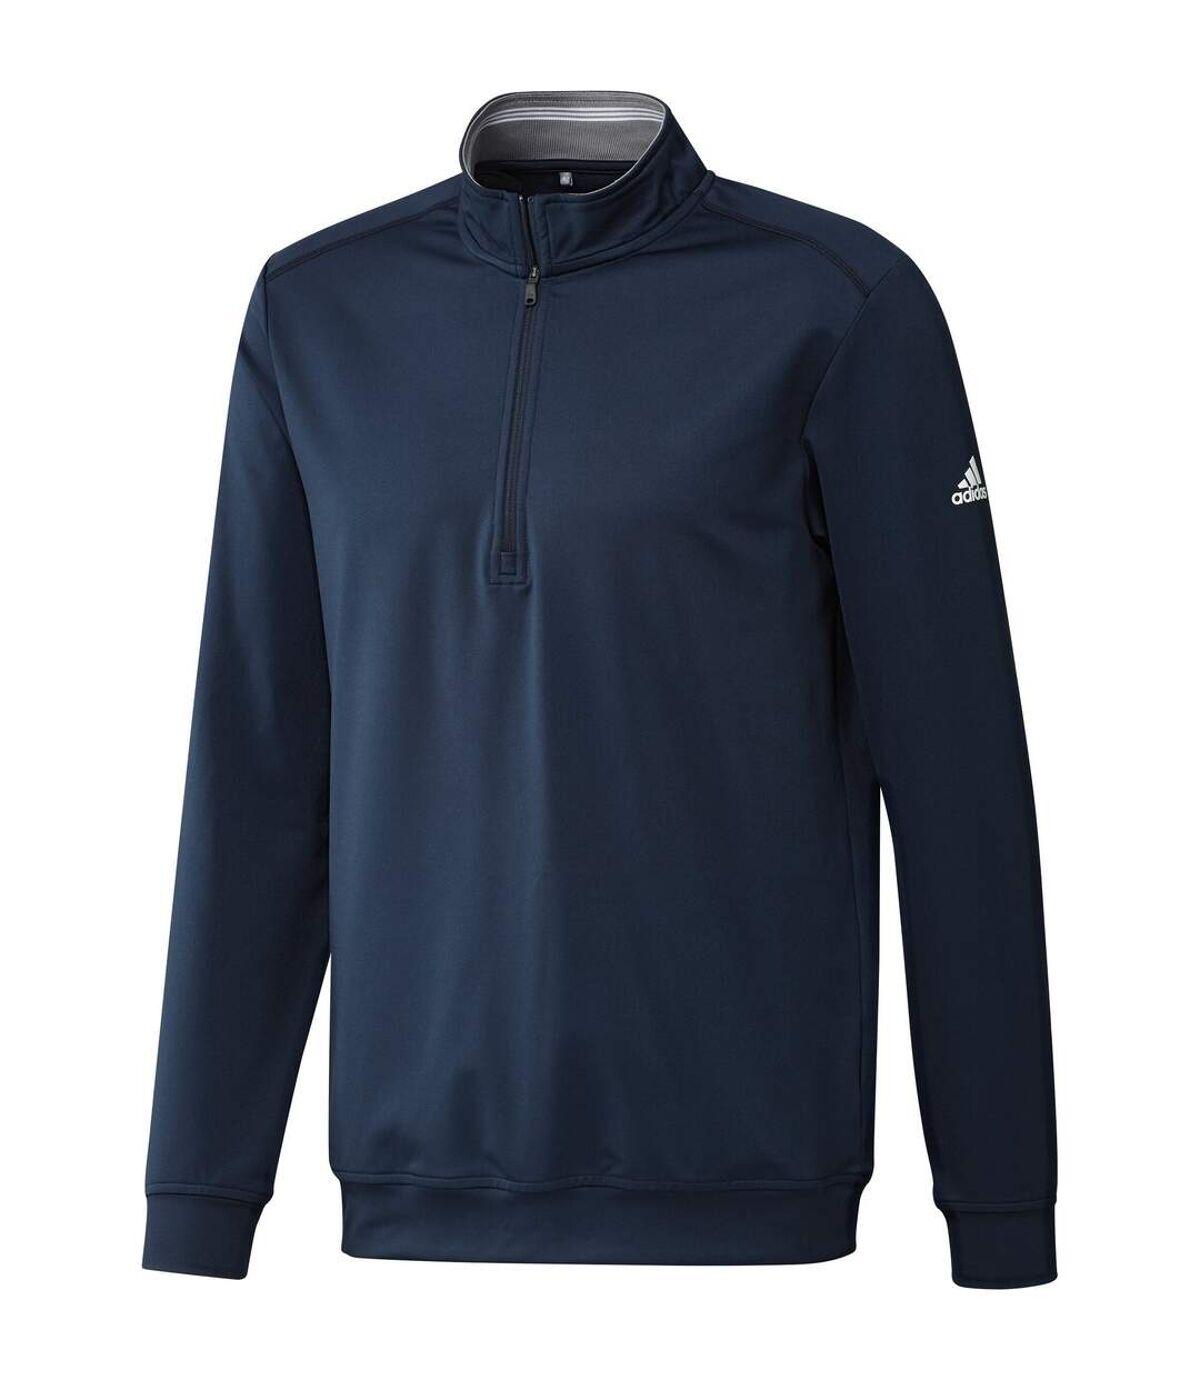 Adidas Mens Classic Club Zip Sweater (Navy) - UTRW7490